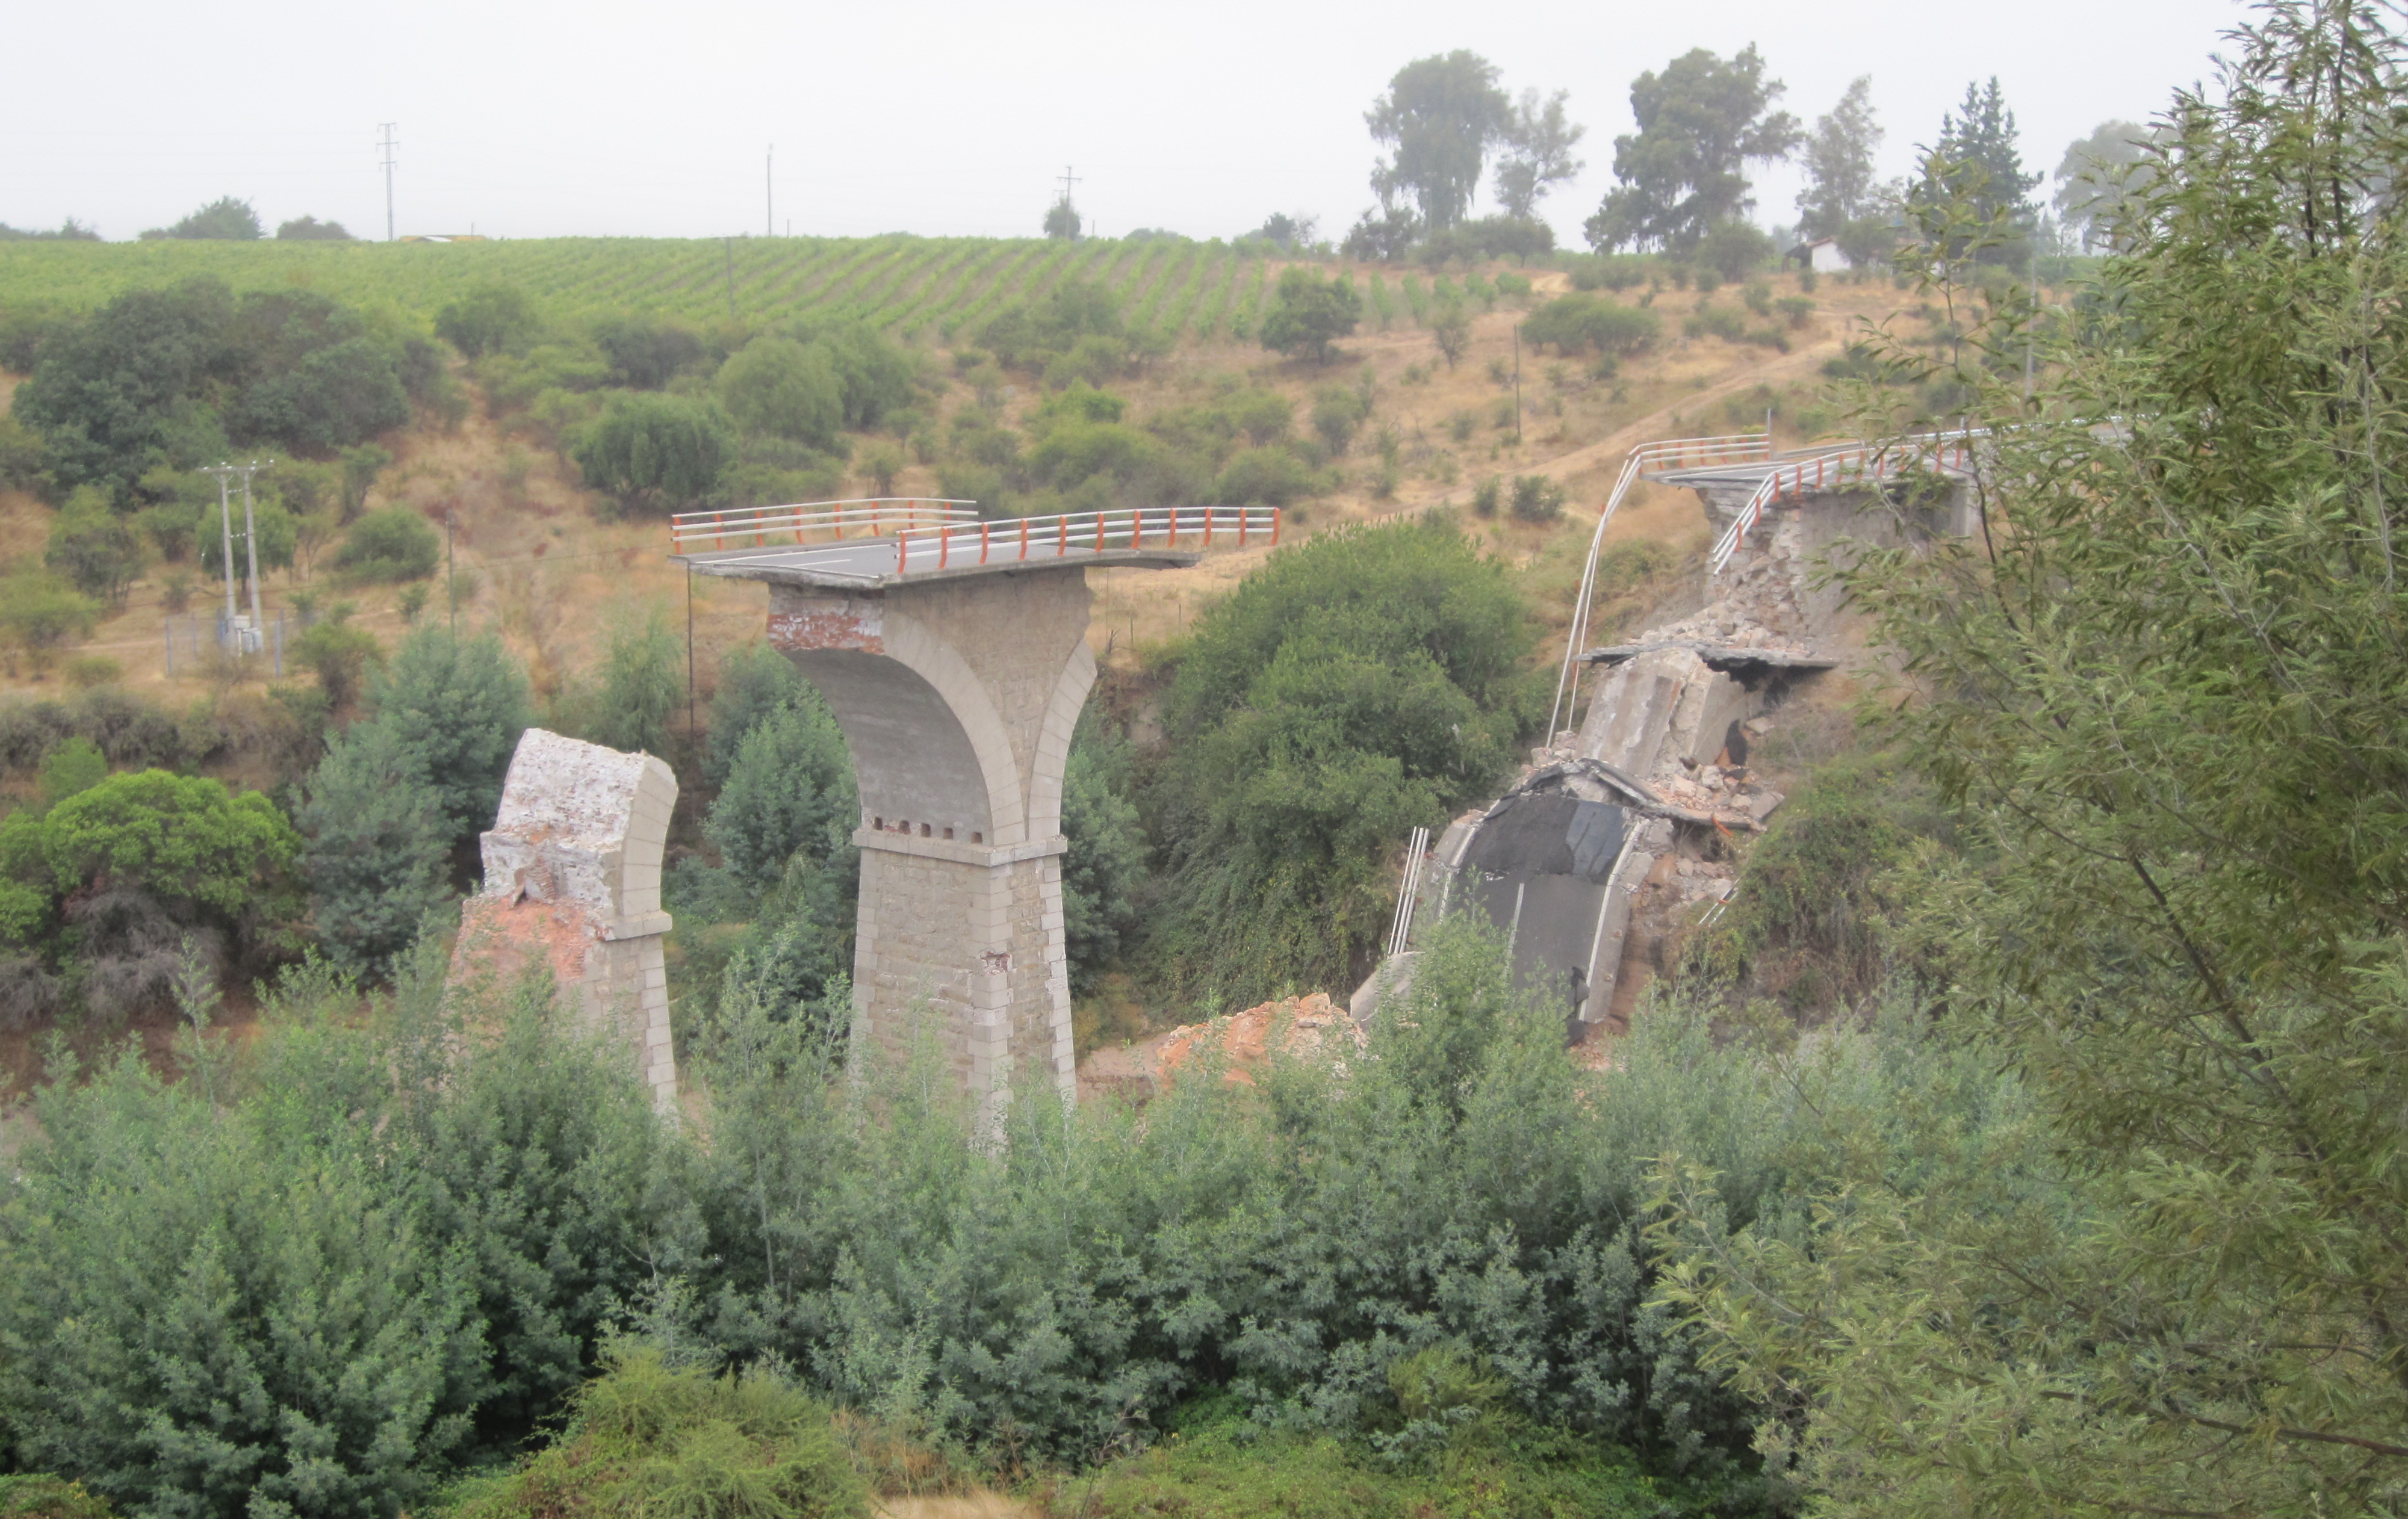 https://commons.wikimedia.org/wiki/File:February_2010_Chile_earthquake_collapsed_masonry_bridge.jpg